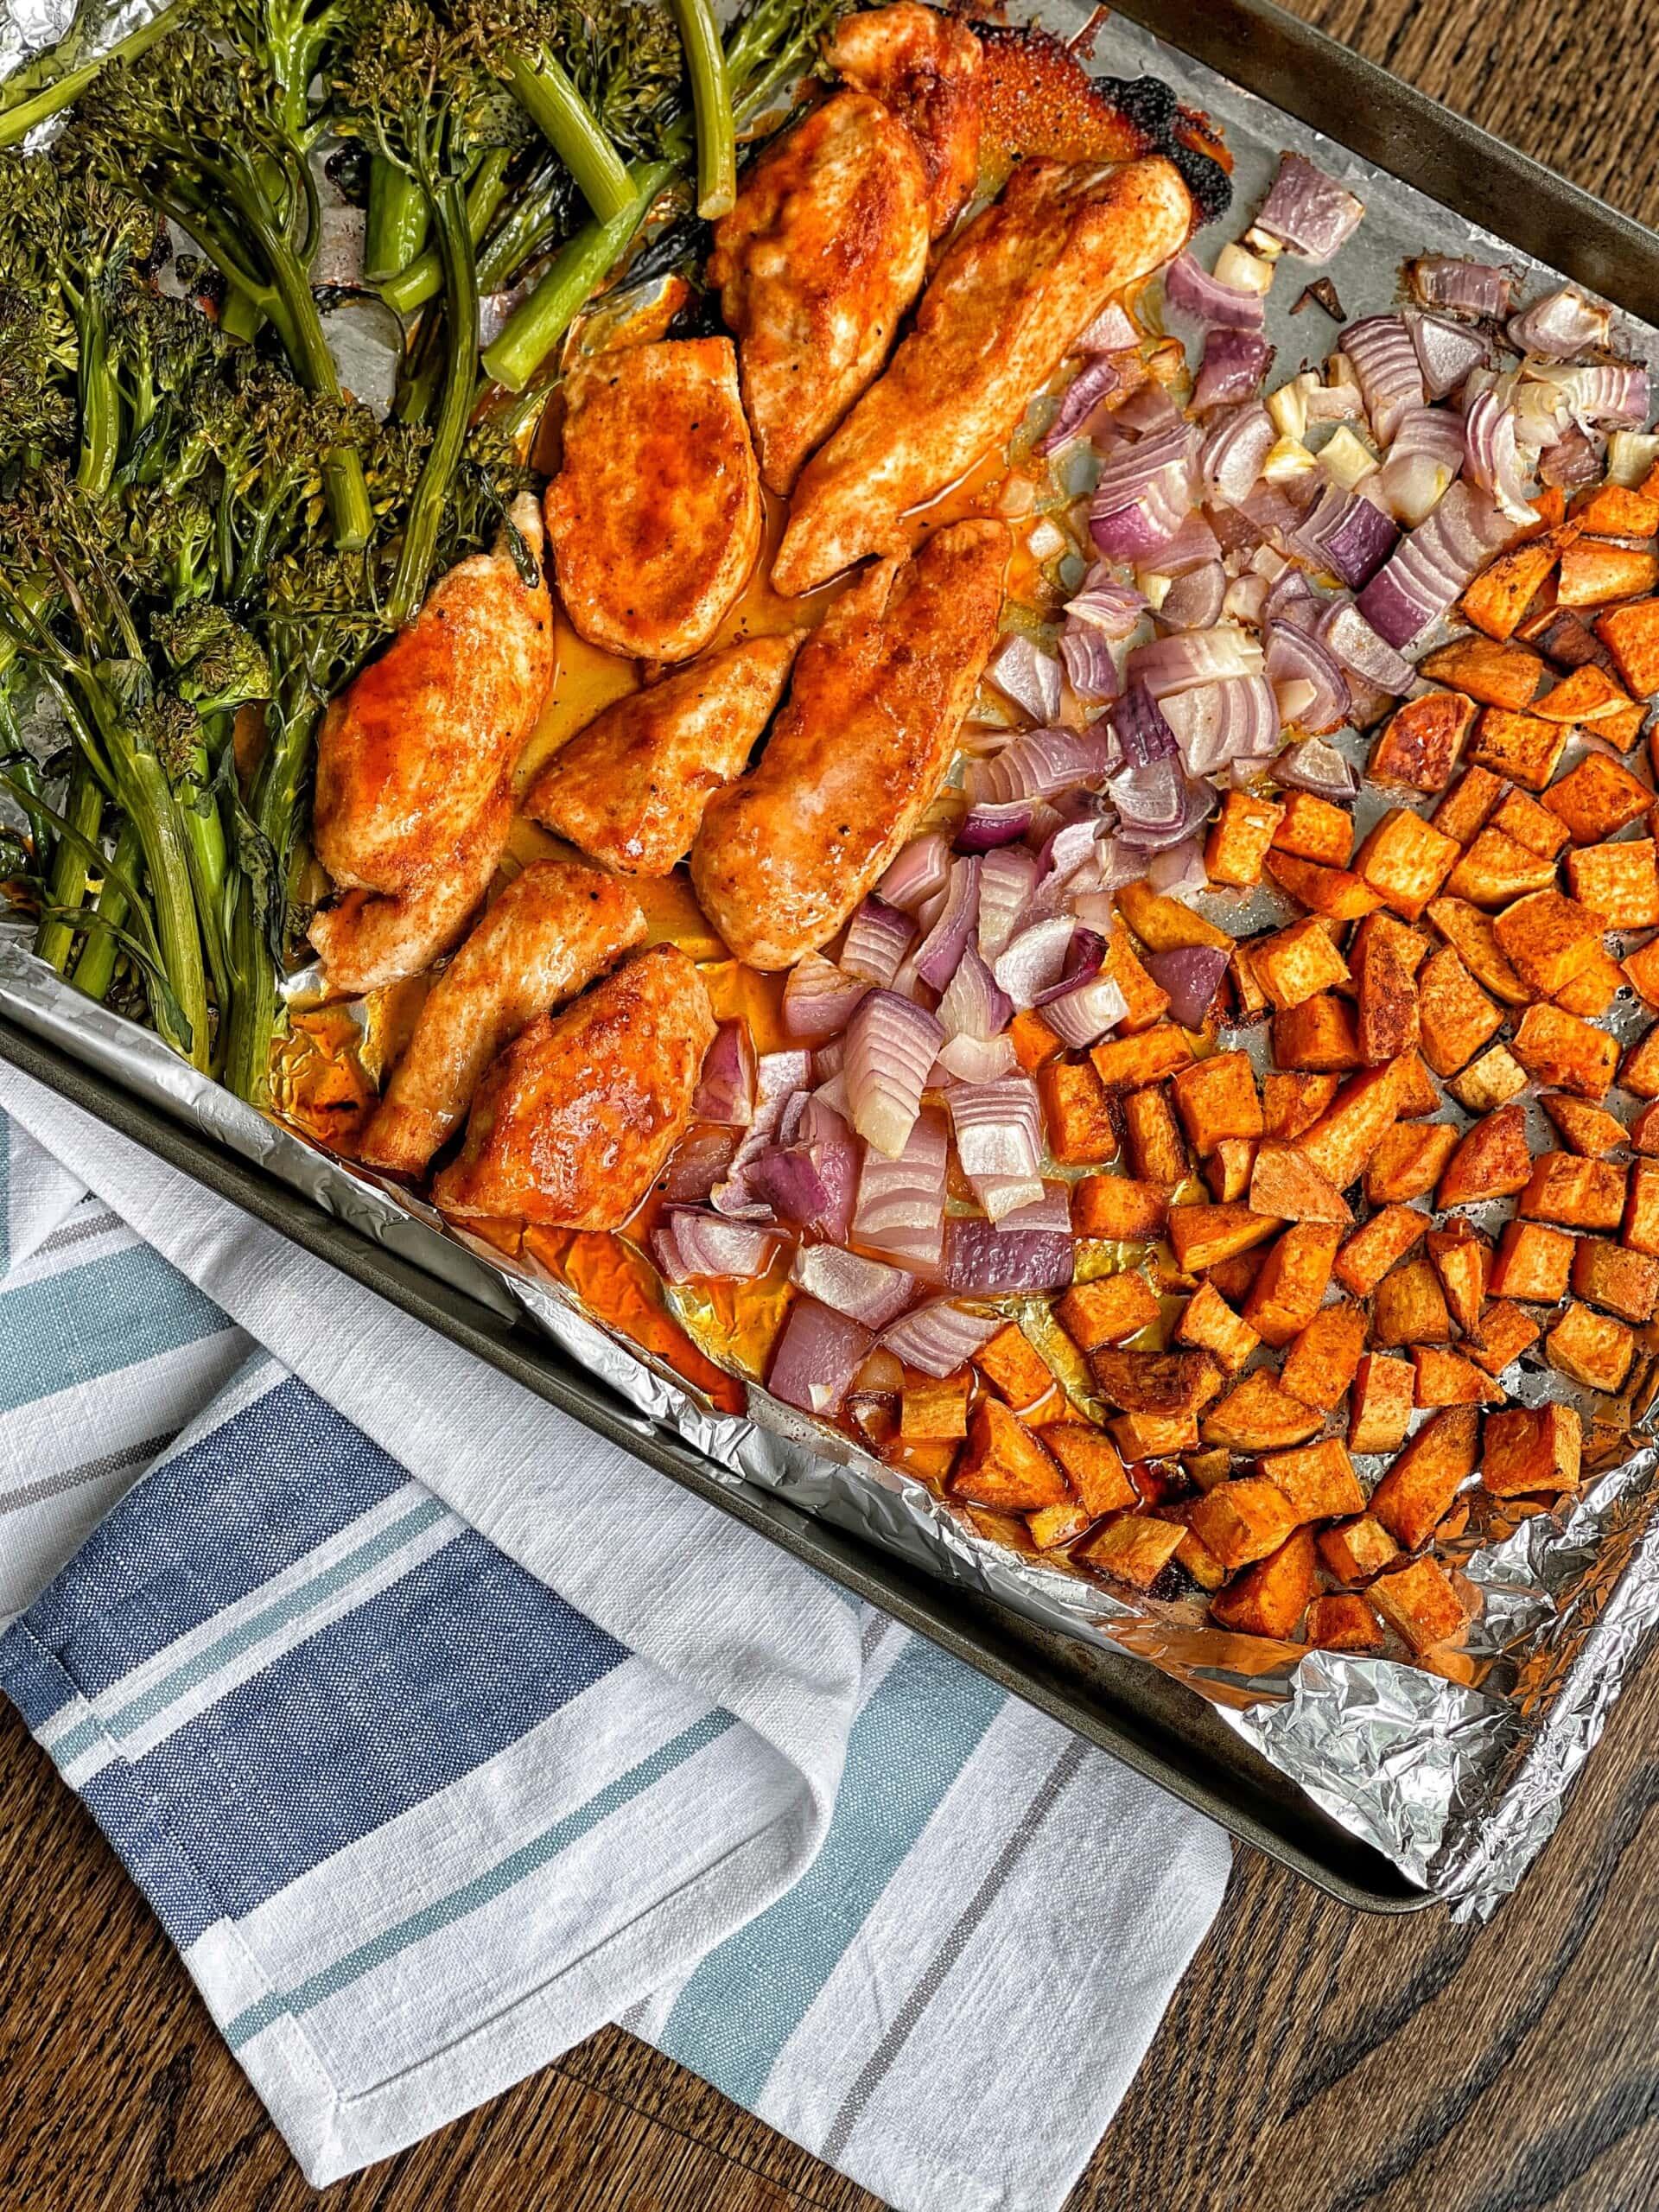 bbq chicken sheet pan meal